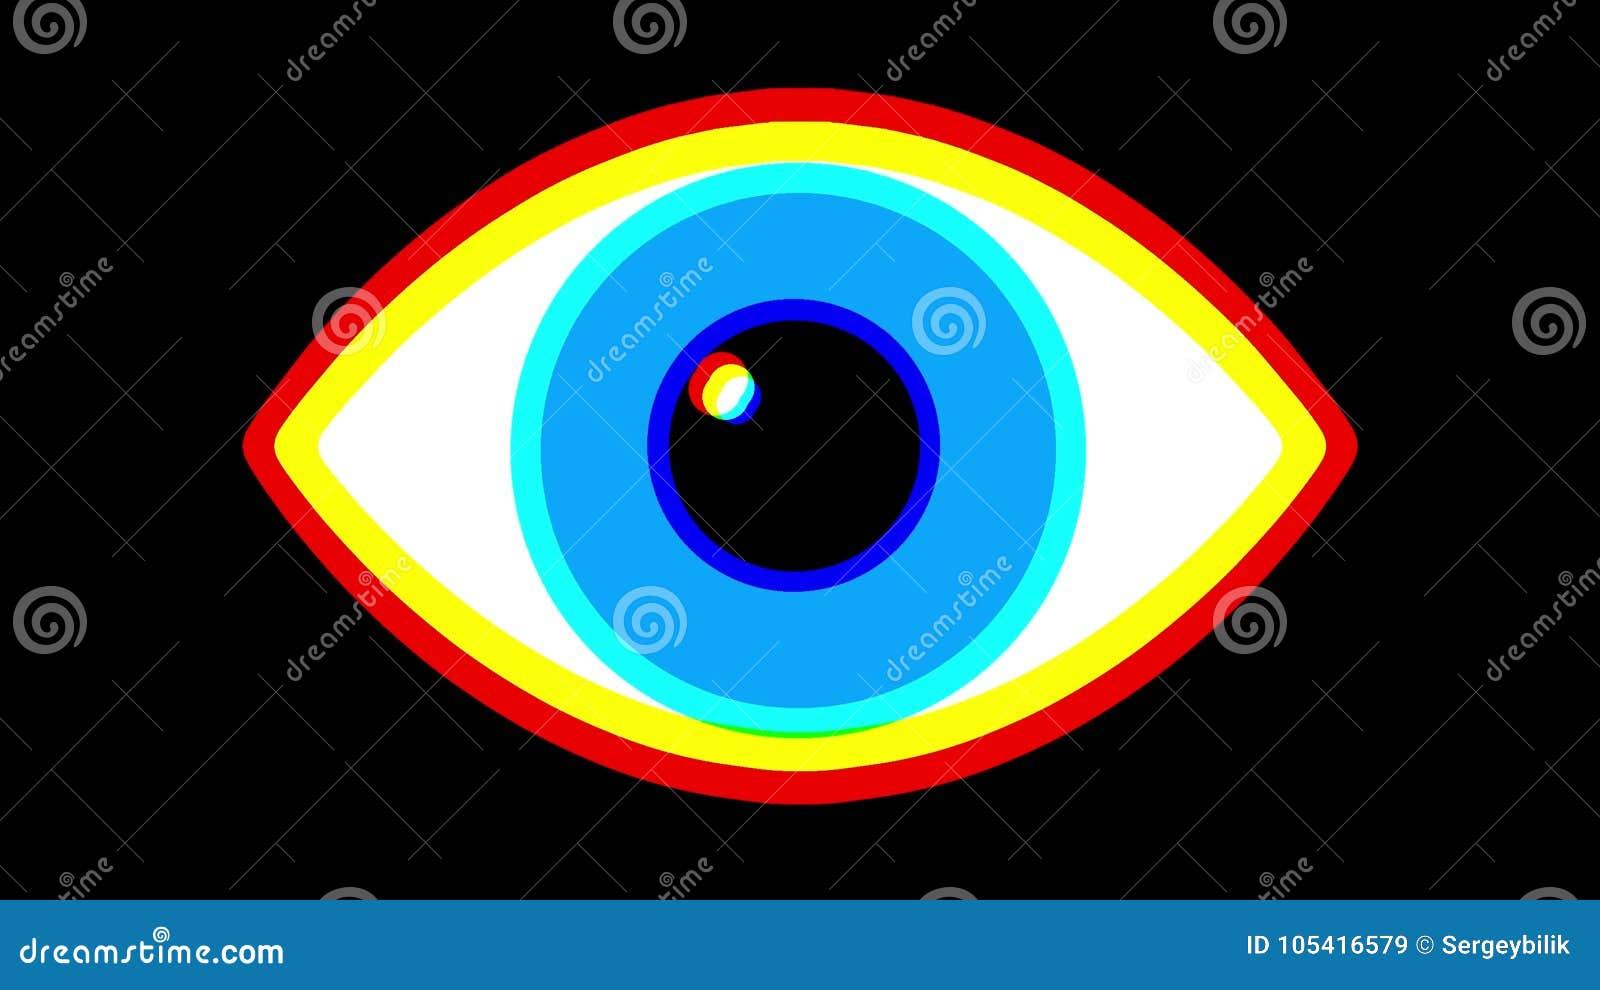 Jumpy Rgb Blue Eye Symbol On Lcd Led Screen Display Background